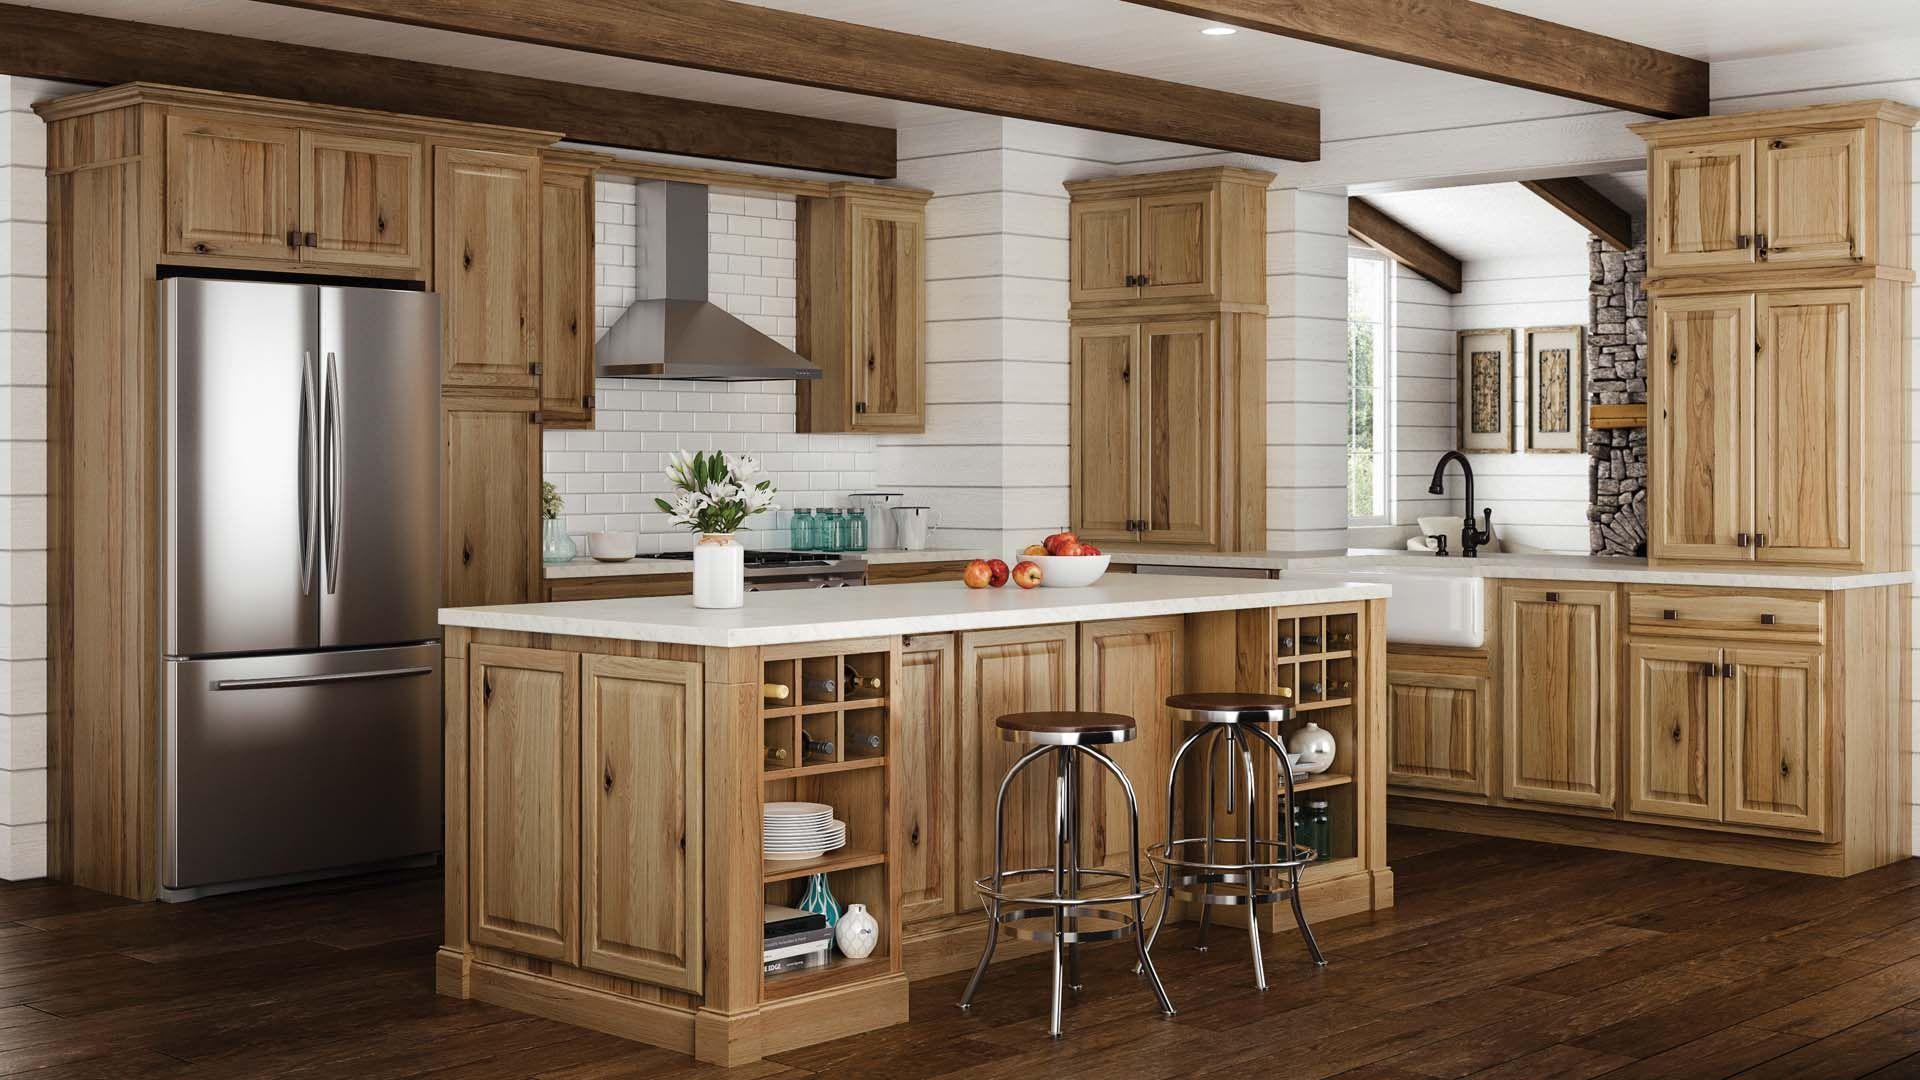 Automatic Kitchen Cabinets Hickory Kitchen Hickory Kitchen Cabinets Hickory Cabinets